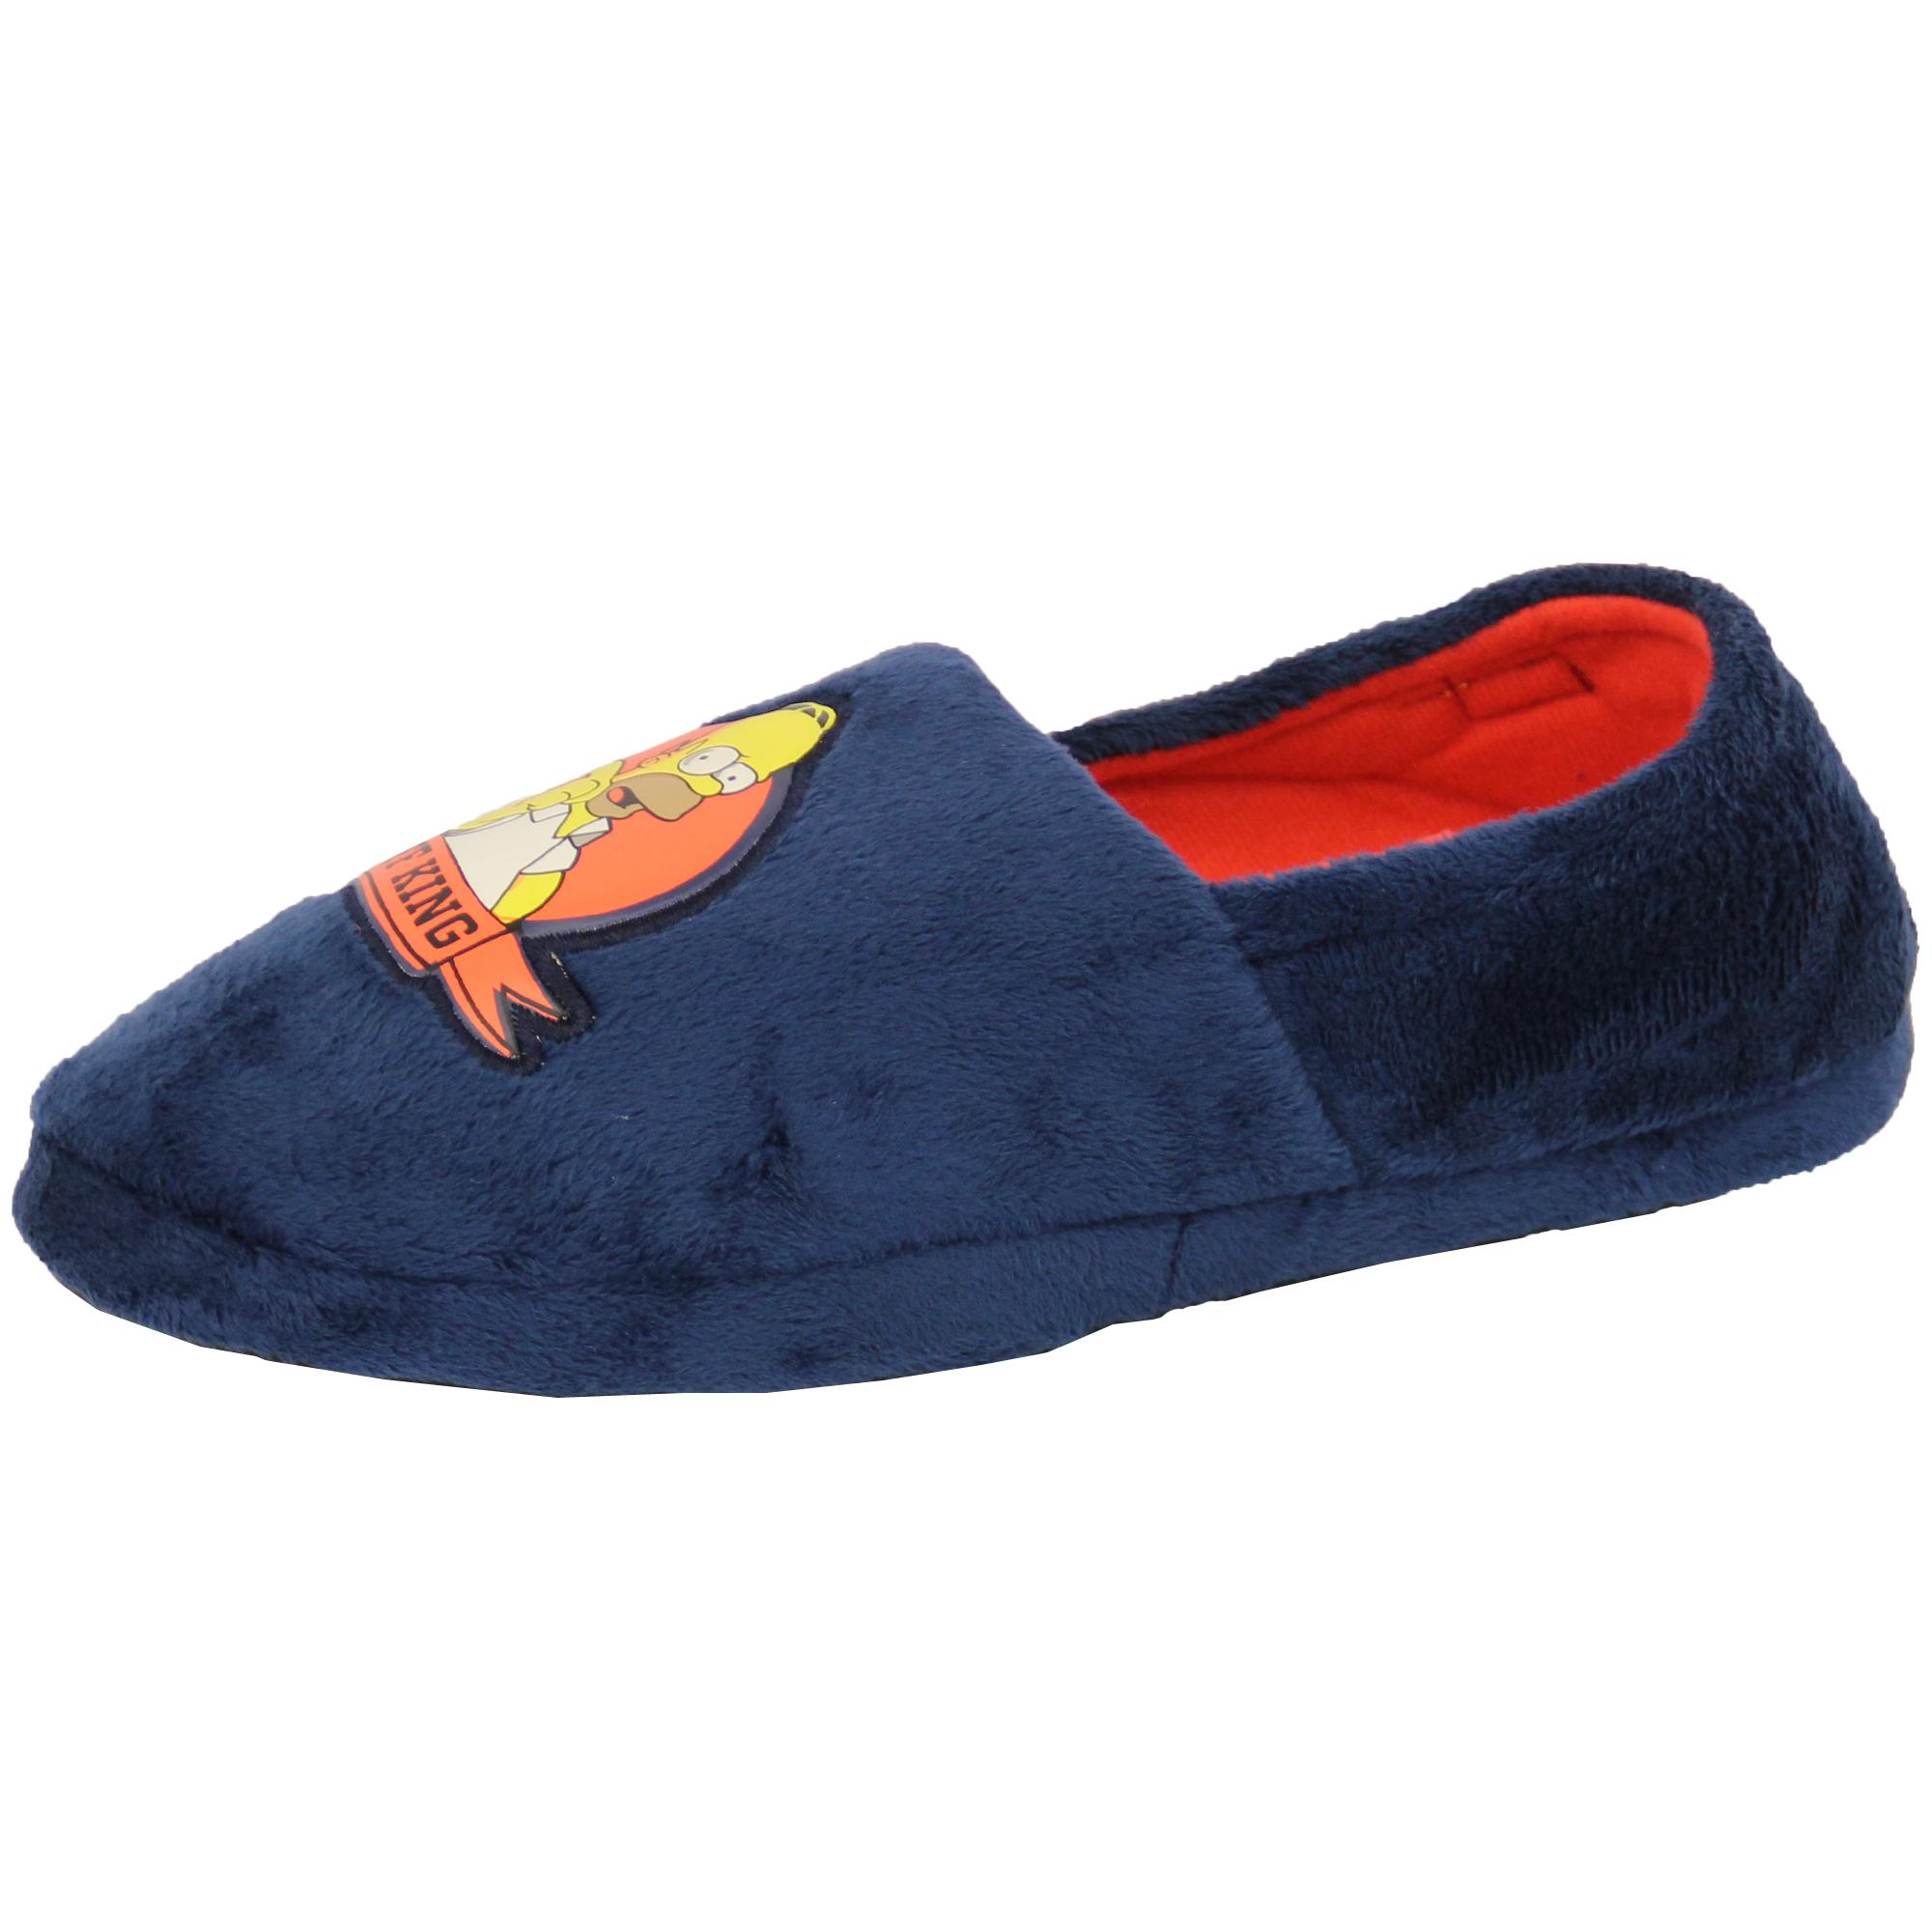 889a65975e59c Mens Slippers Homer Simpsons Minions Star Wars Tetley Mule Sandals ...